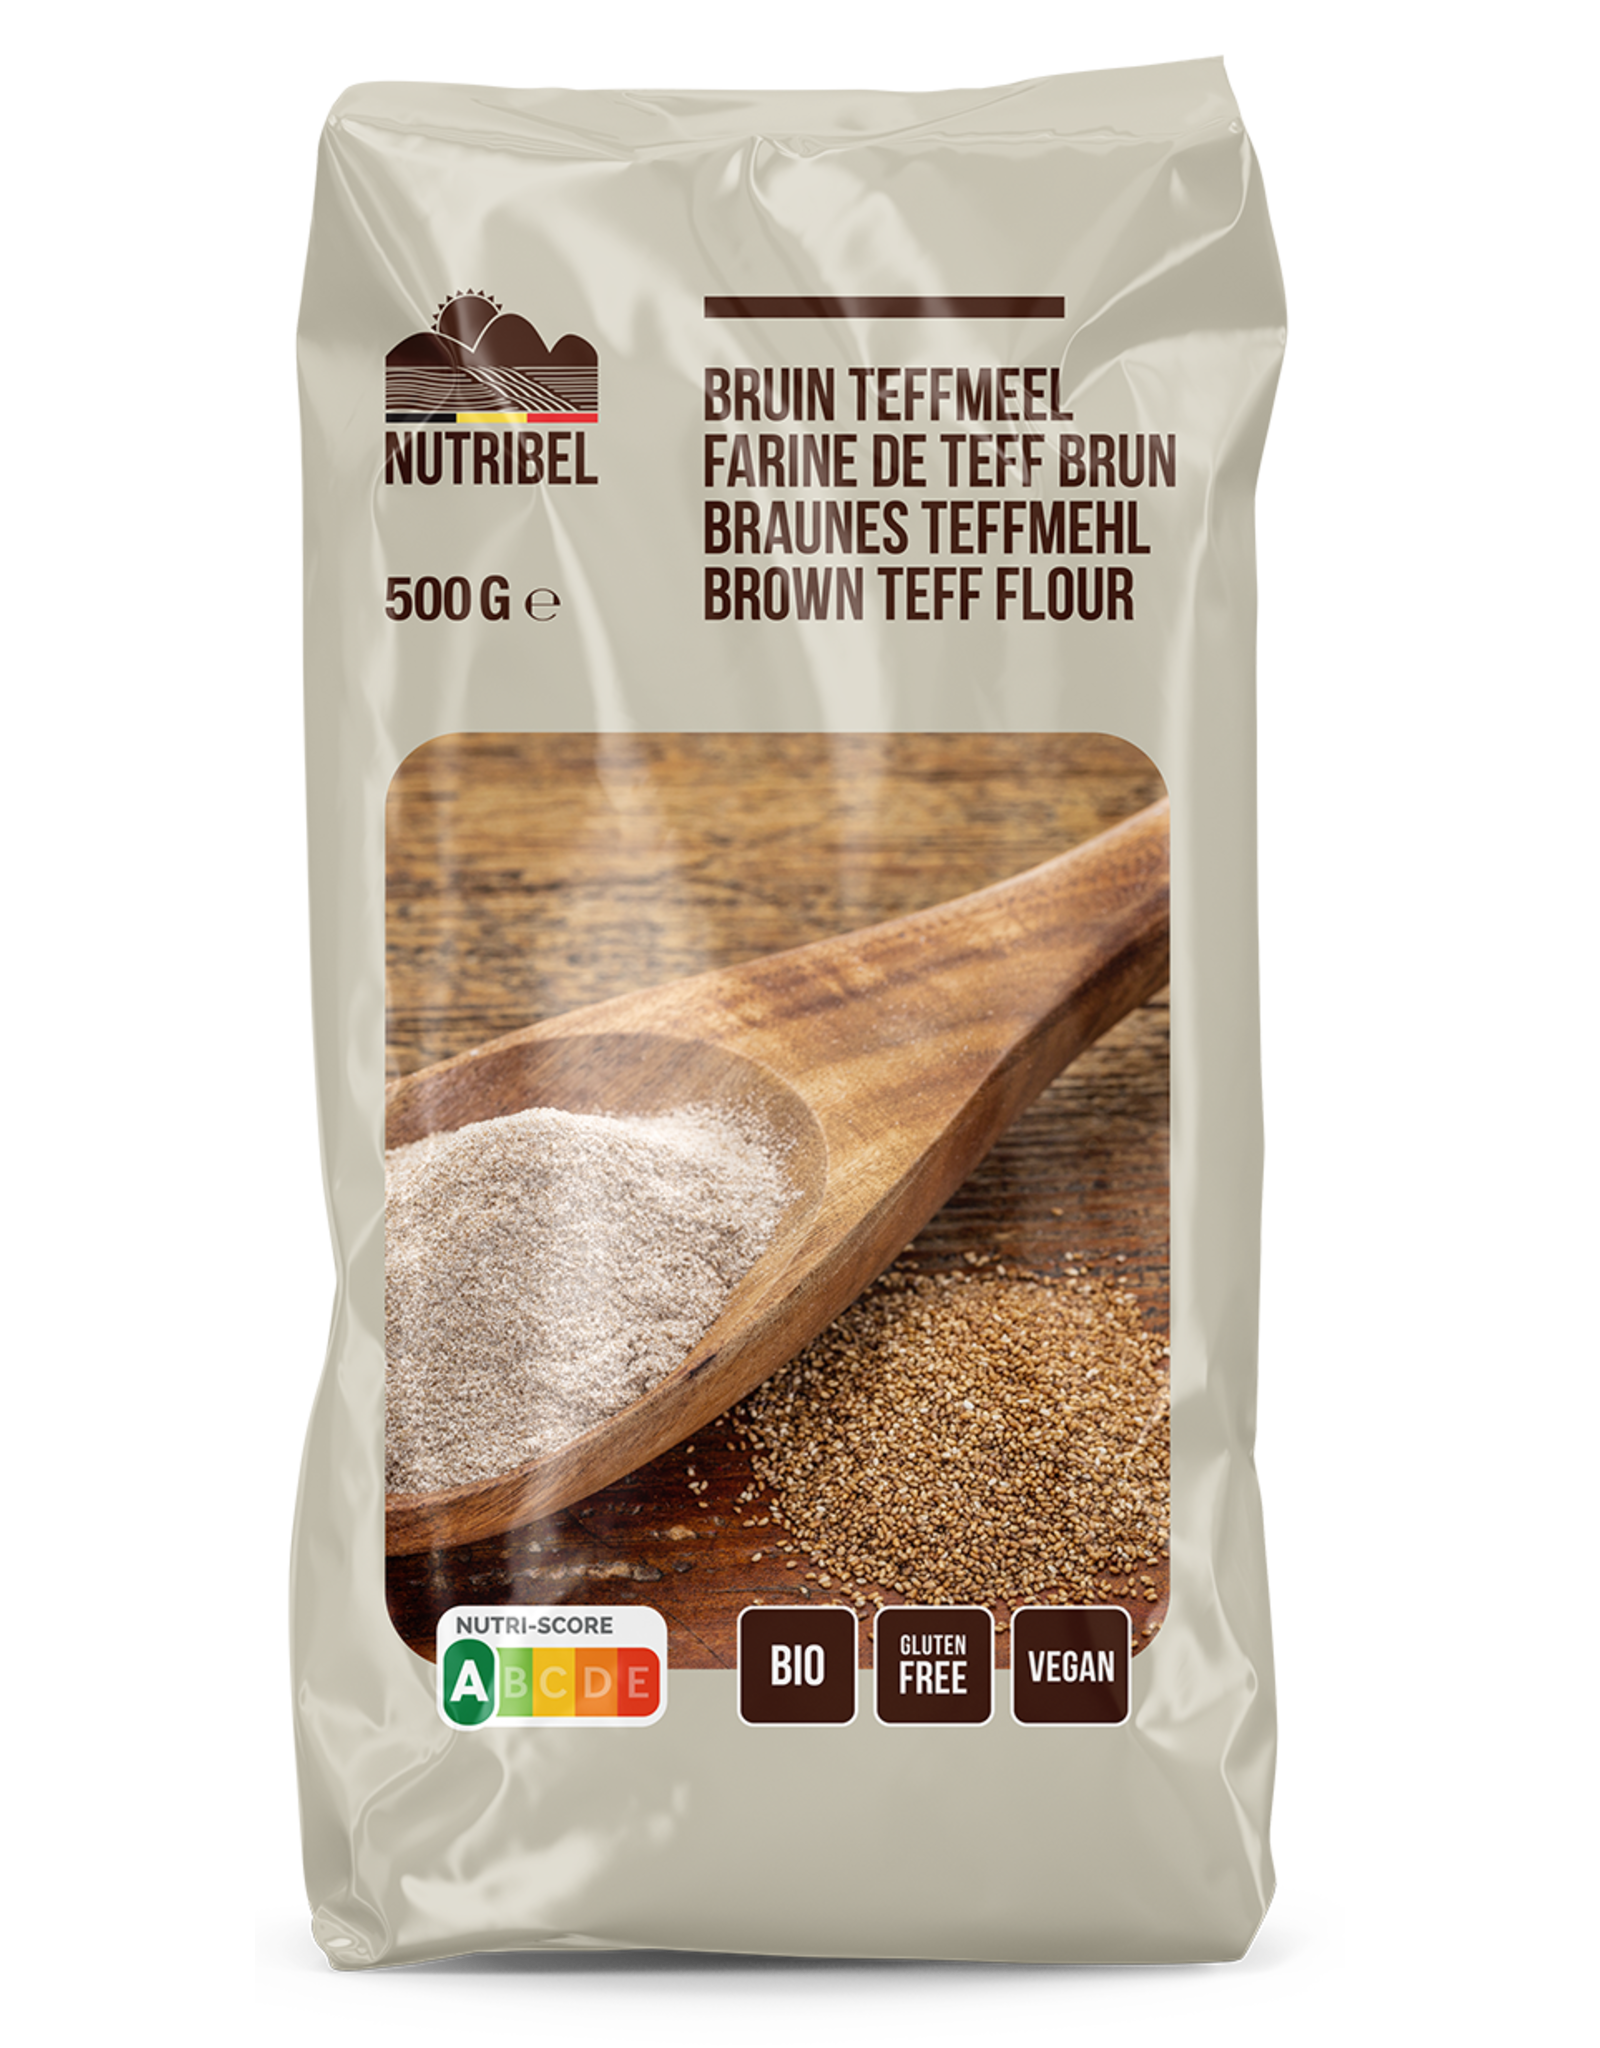 Nutribel Farine de teff bio & sans gluten 500g